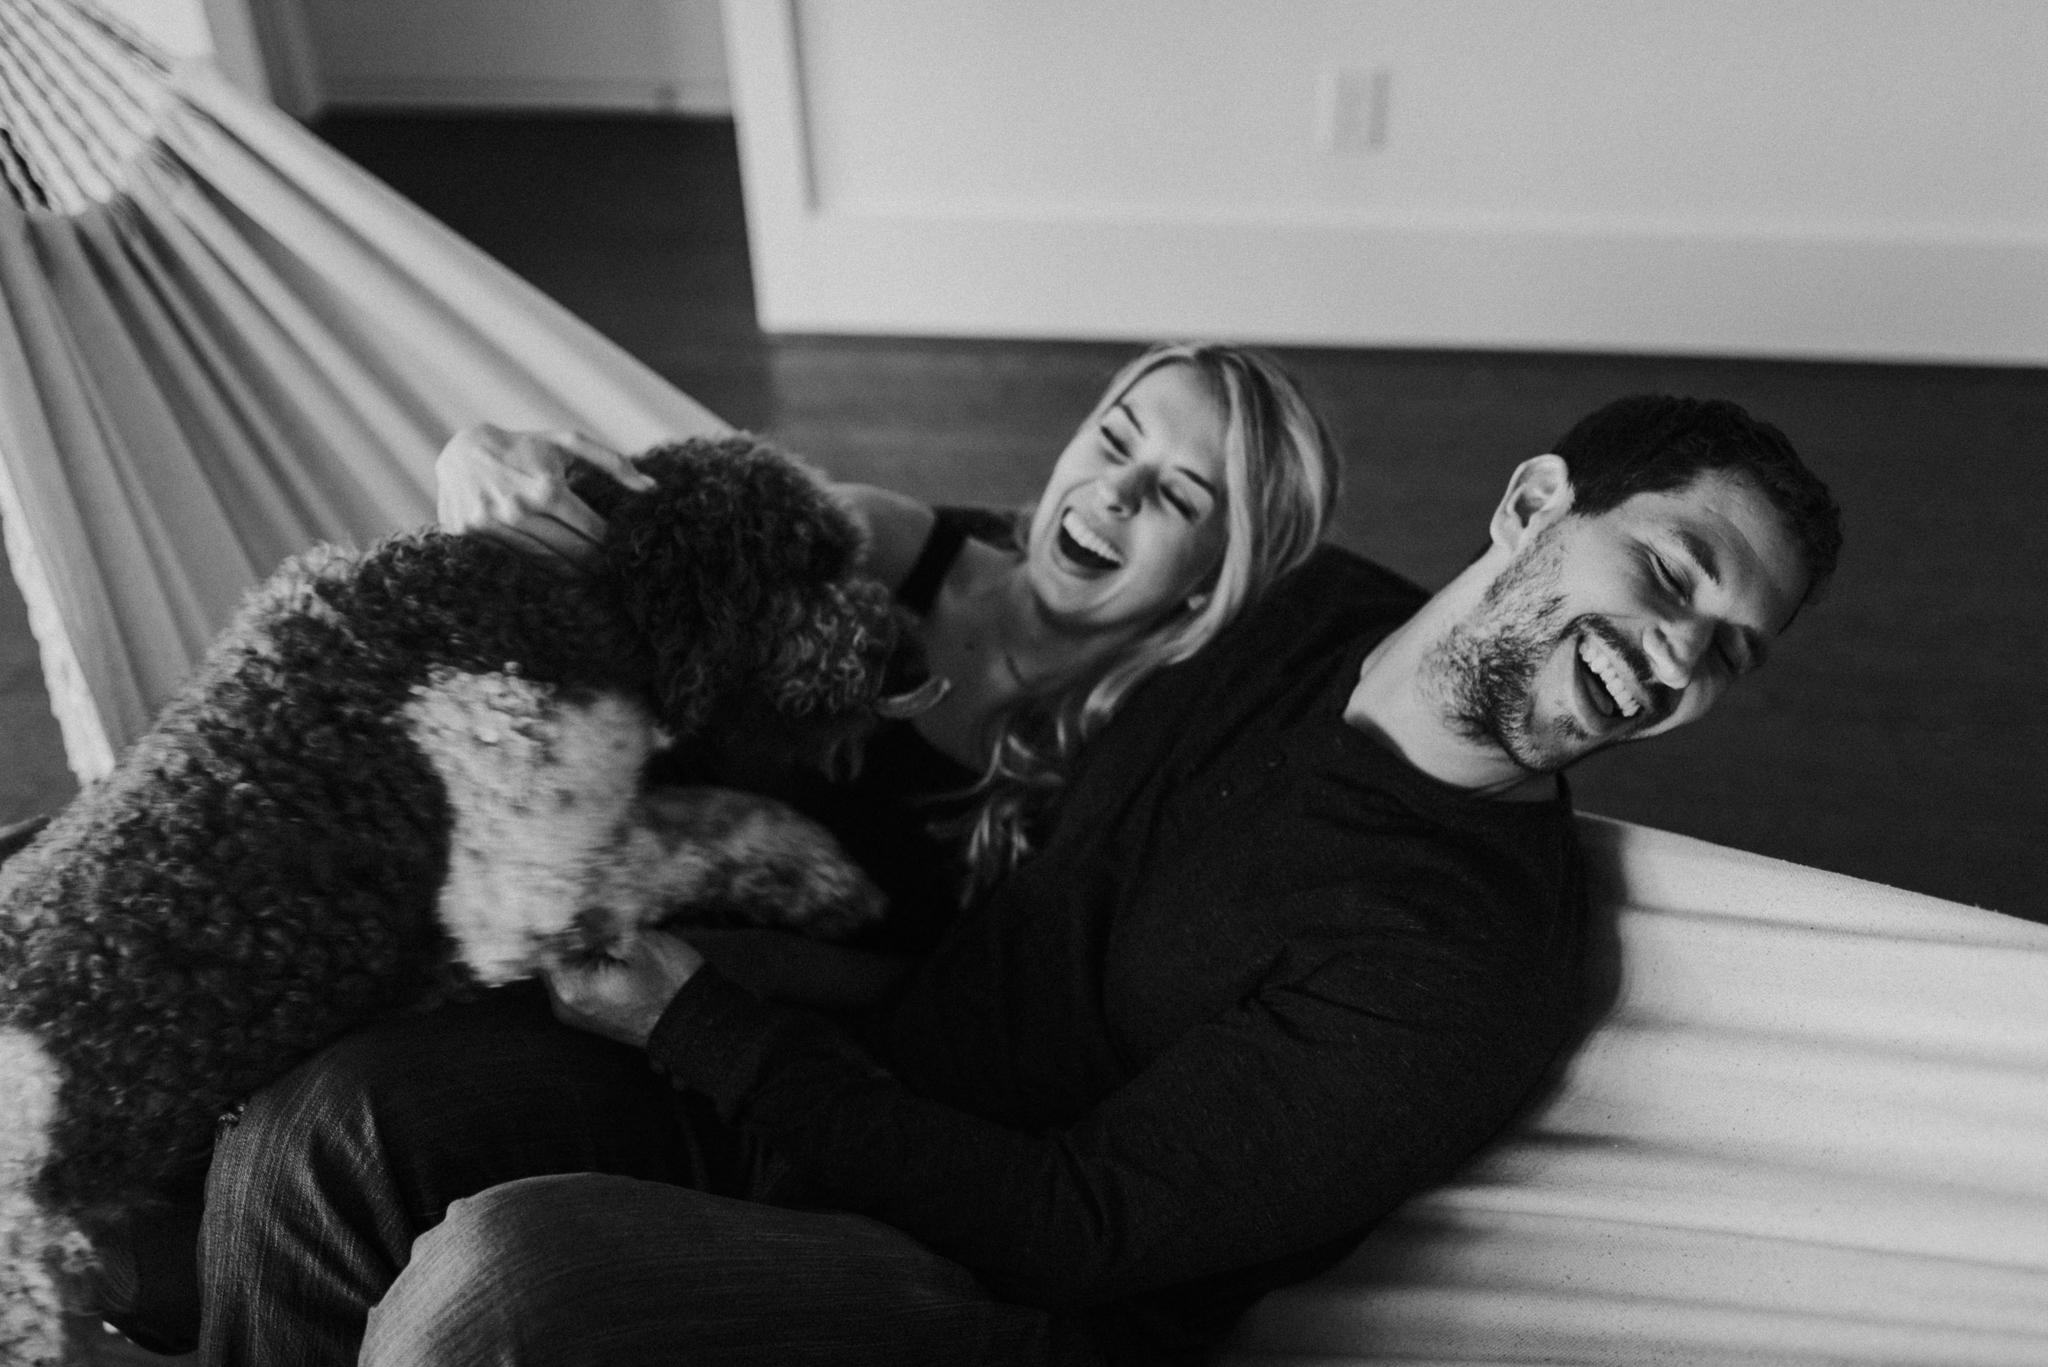 Houston Wedding Photographer-Houston In Home Engagement Session- Houston Wedding Photographer -Kristen Giles Photography-62.jpg